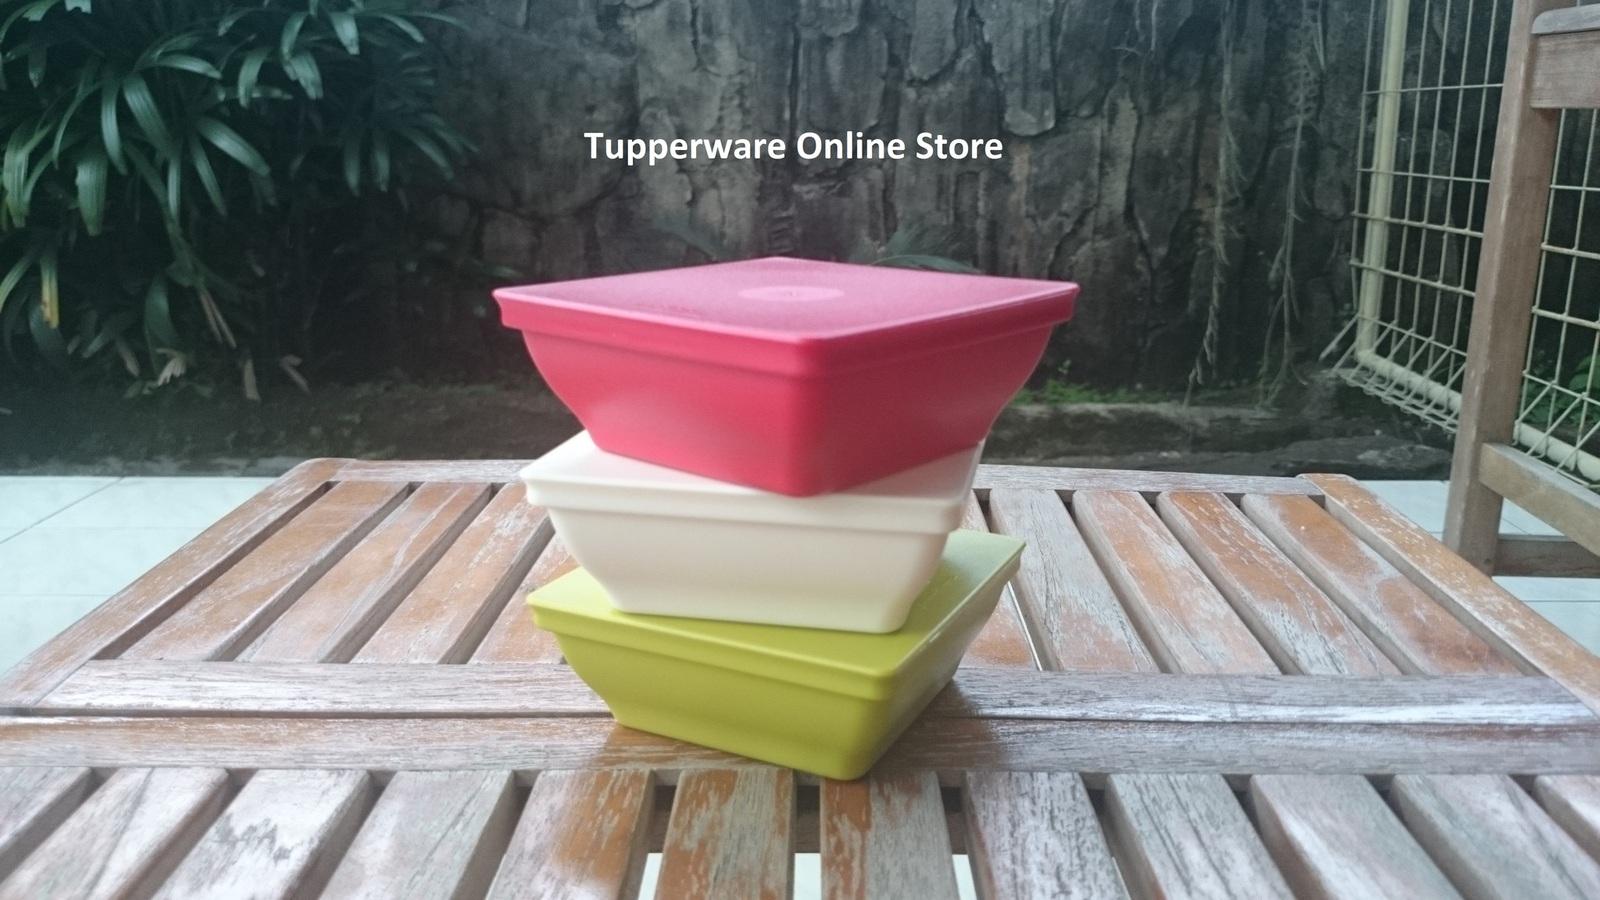 New 1 Set 3 Pcs Tupperware Petit Ichigo And 50 Similar Items Eleganzia Bowl 600ml 4 3pcs